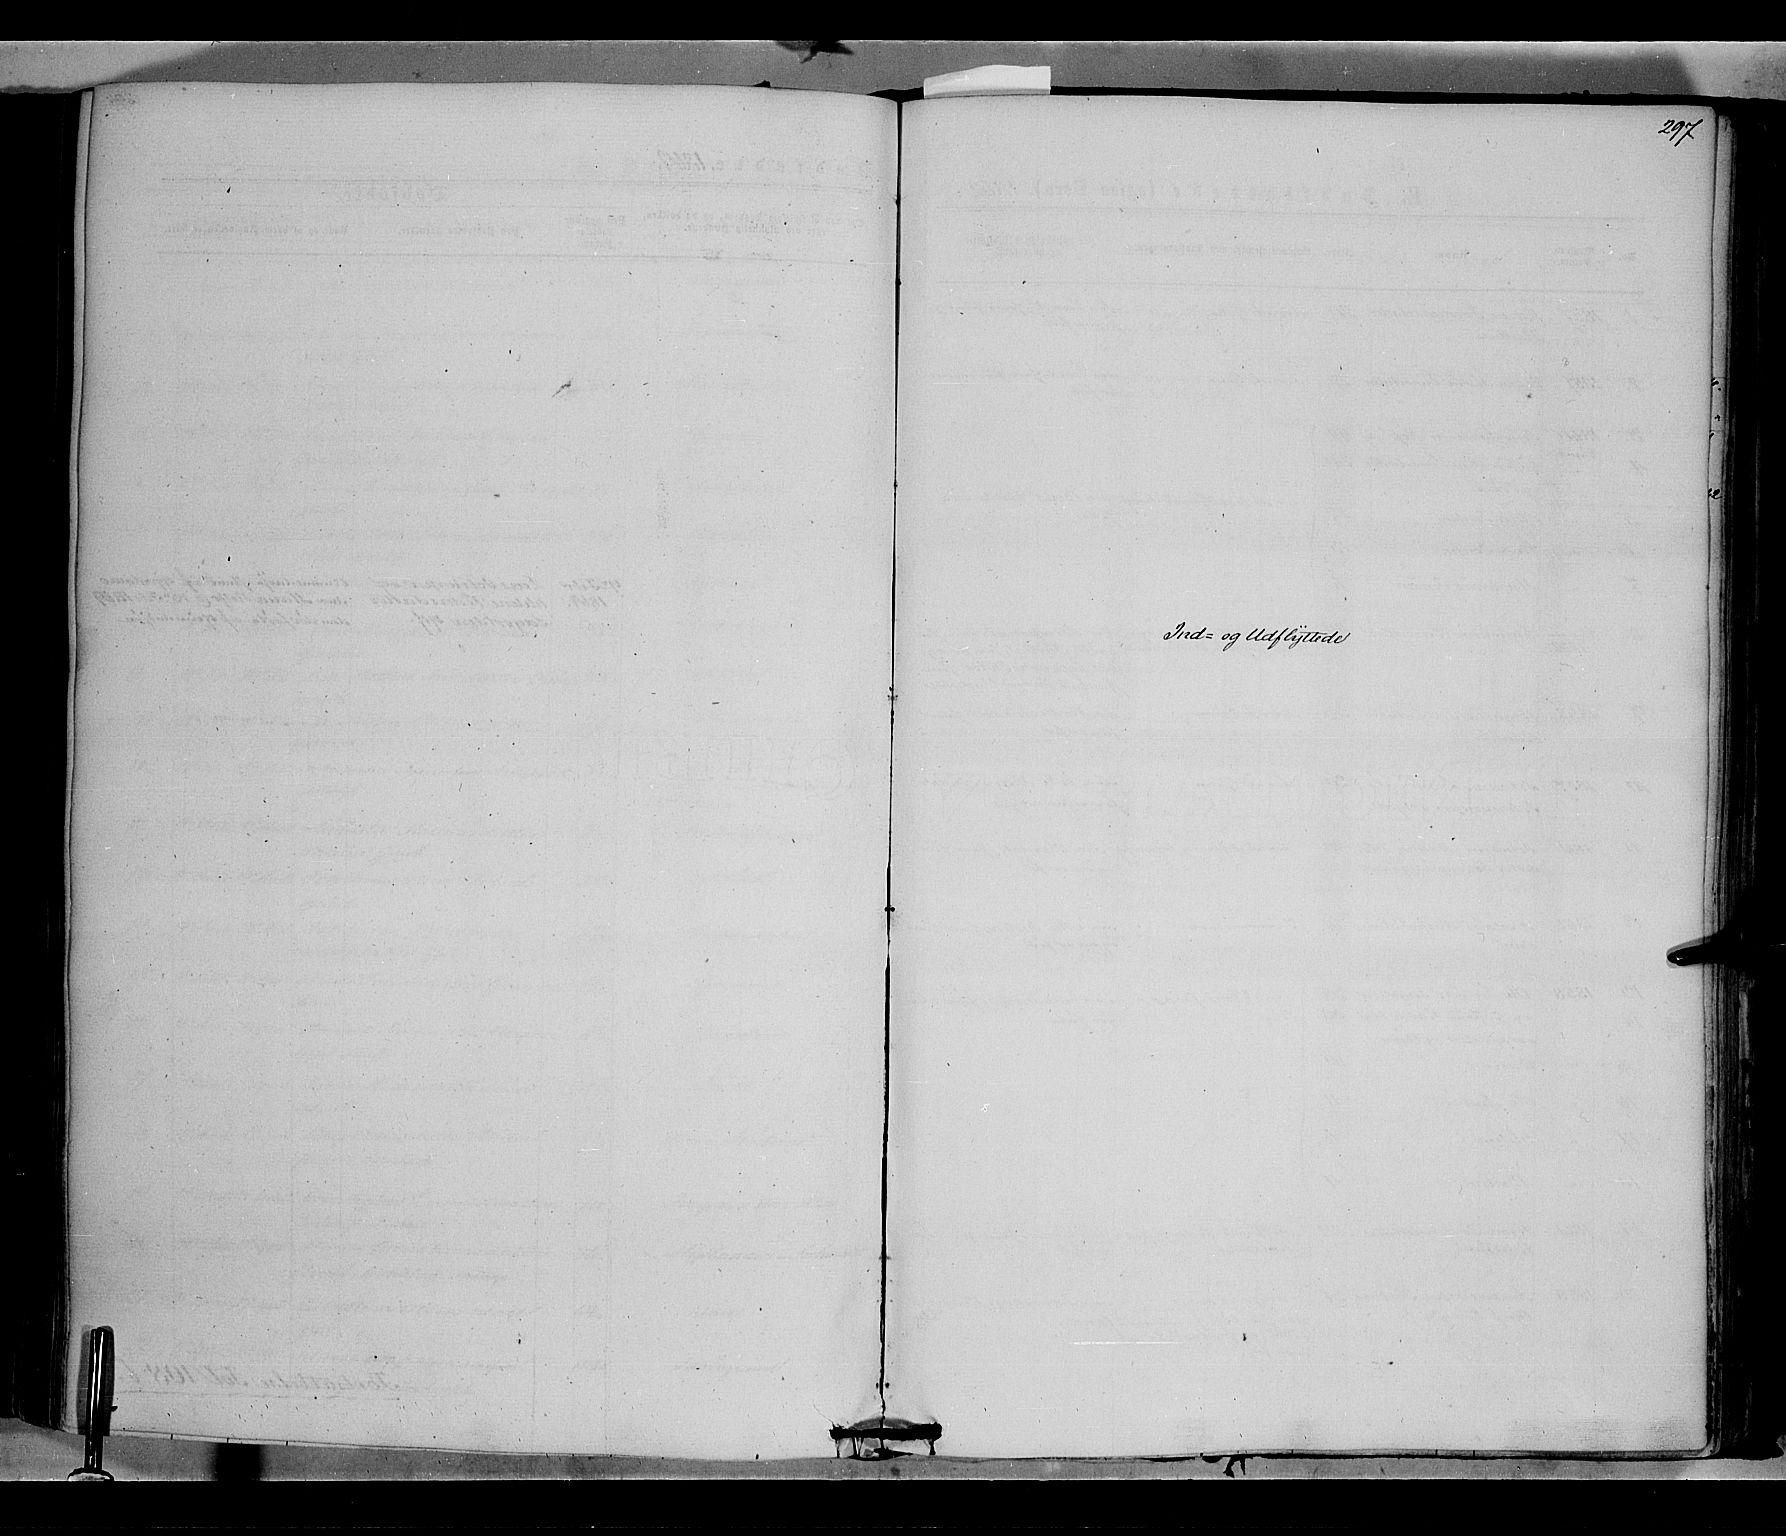 SAH, Vestre Toten prestekontor, H/Ha/Haa/L0007: Ministerialbok nr. 7, 1862-1869, s. 297